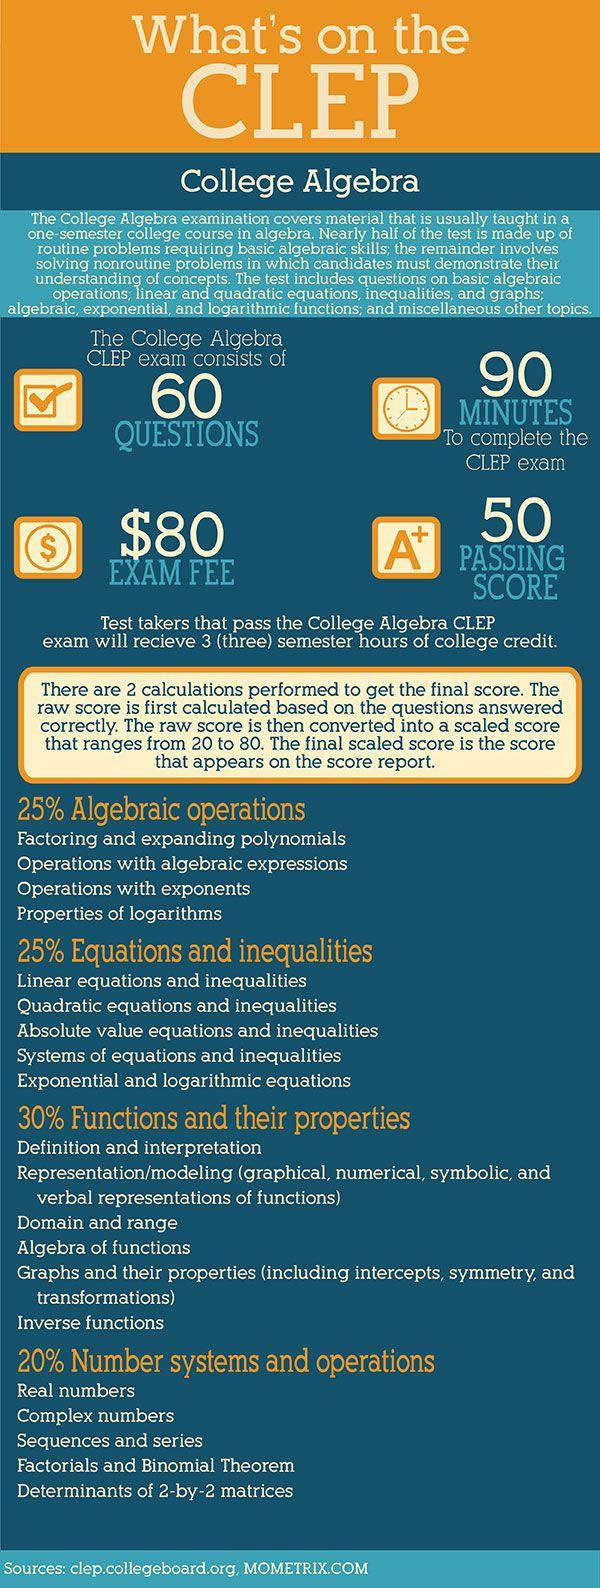 CLEP College Algebra Test Breakdown